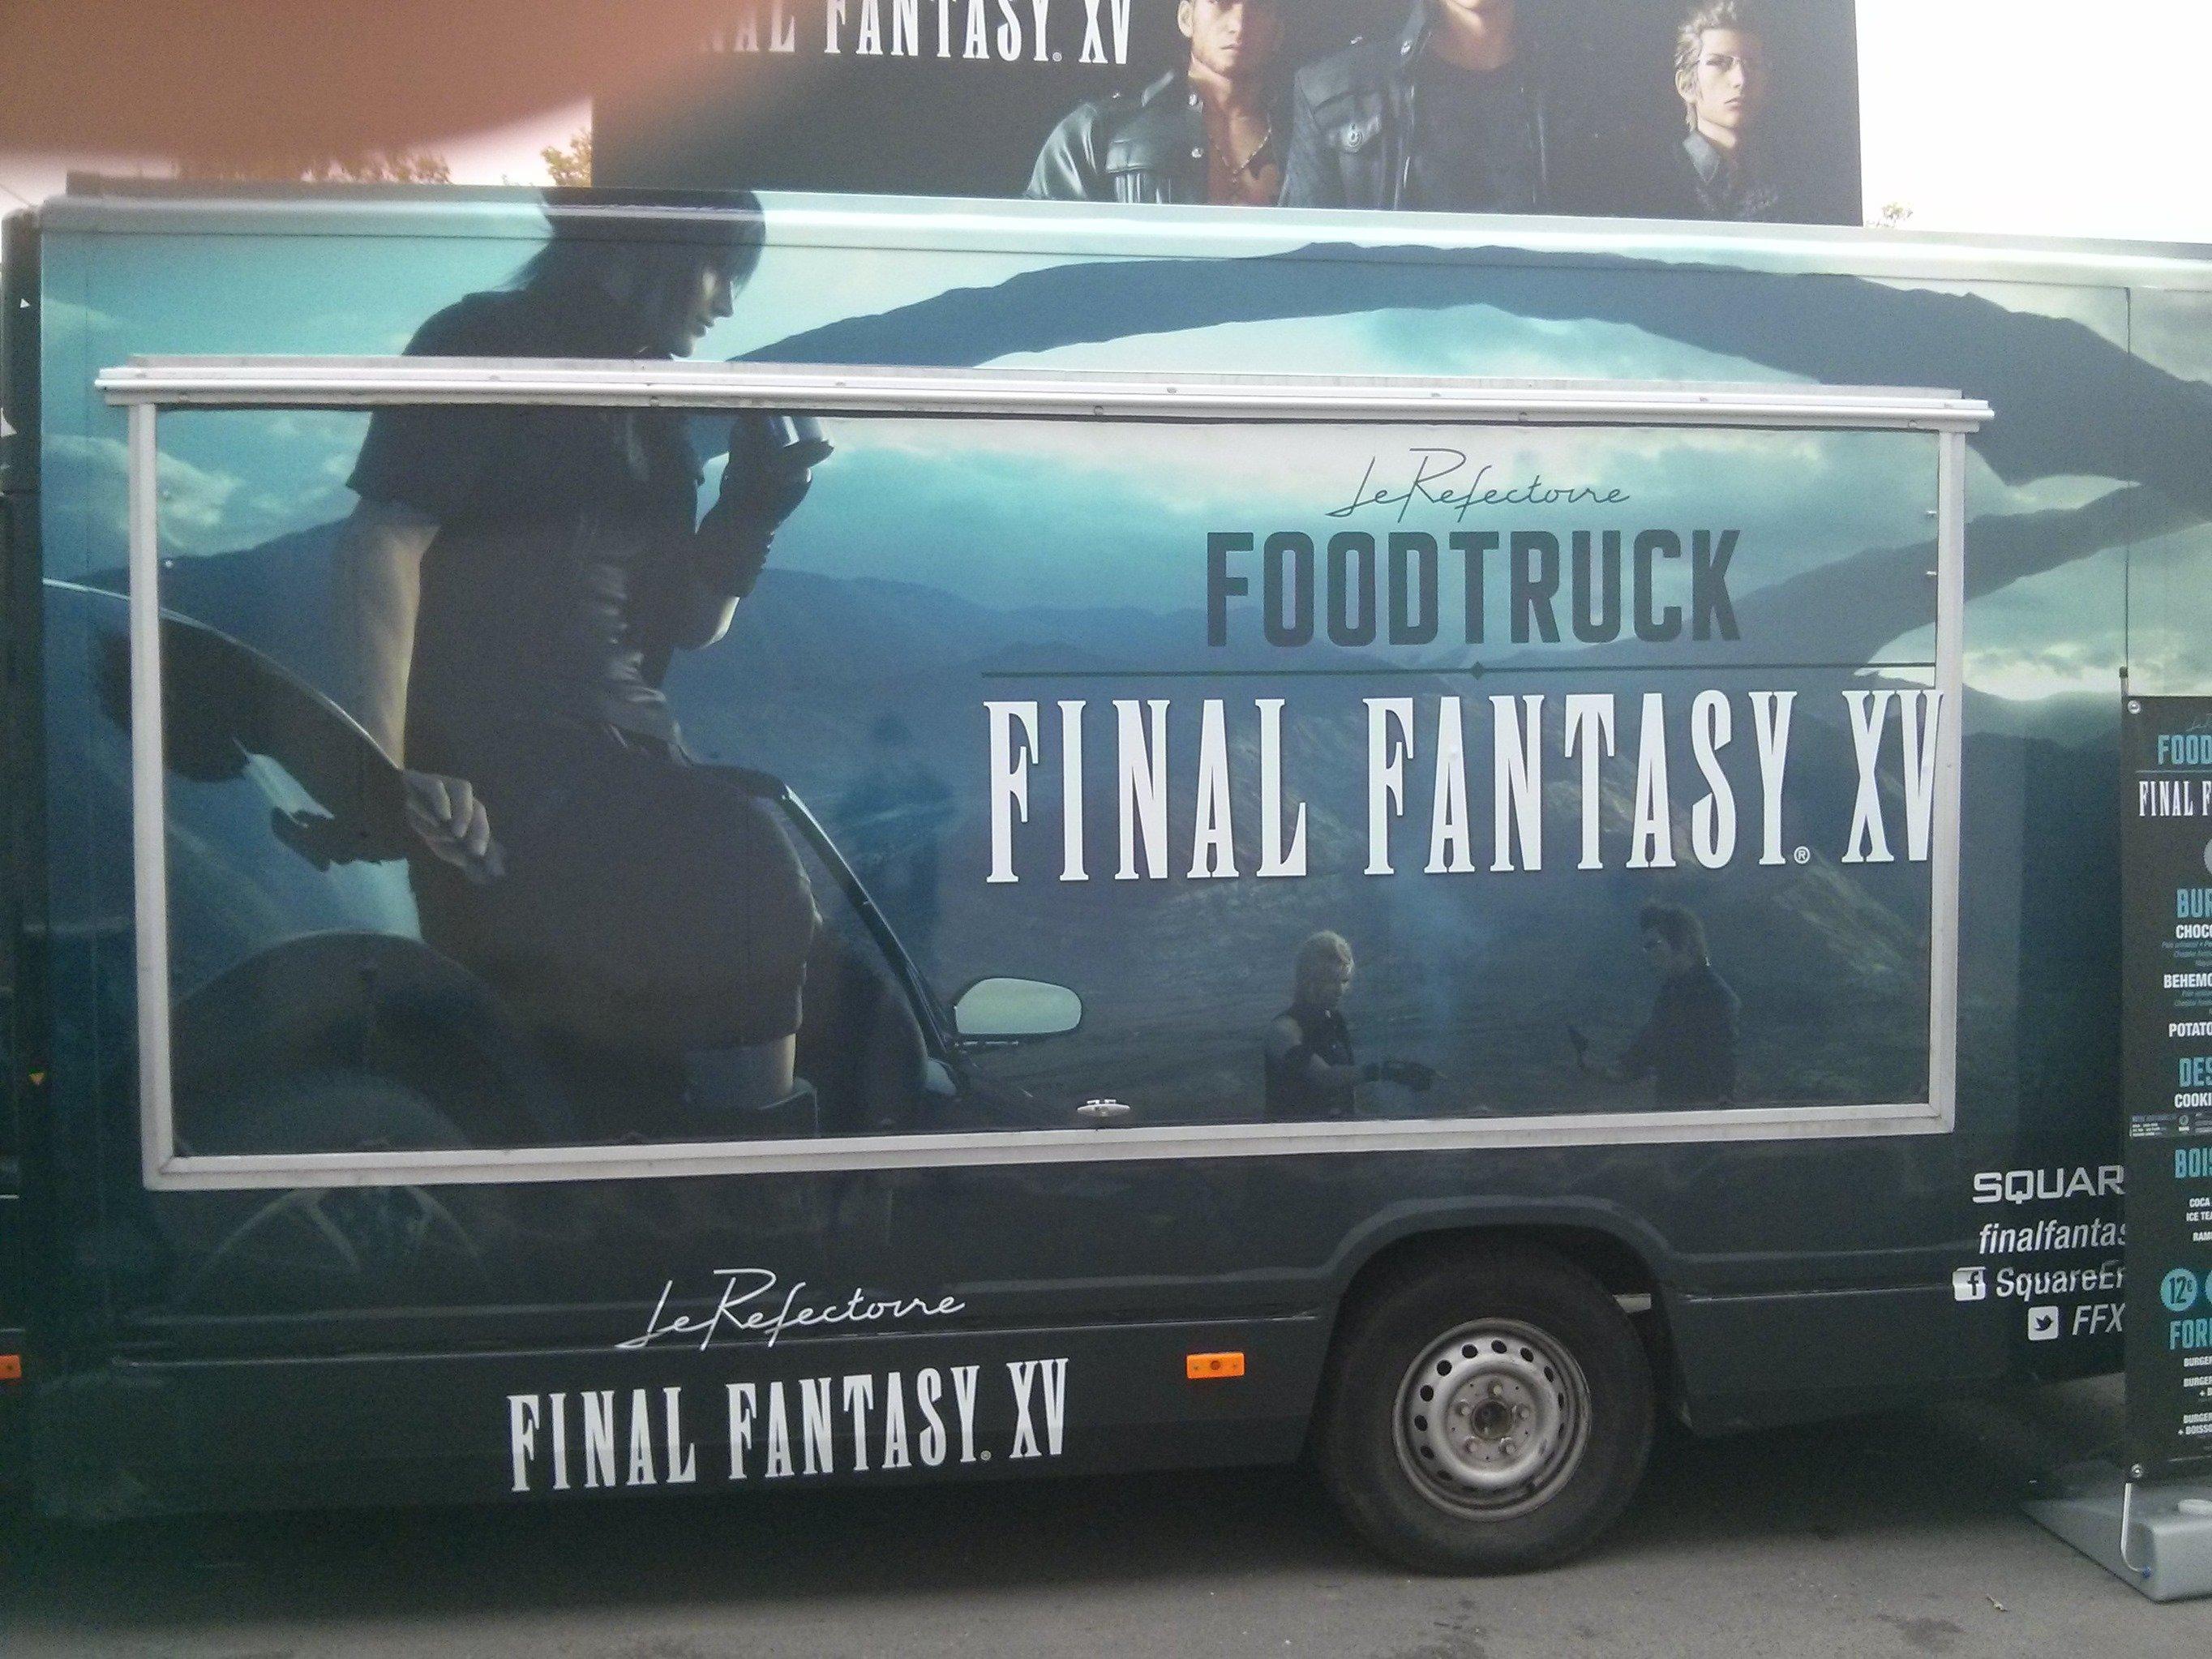 Final Fantasy XV Food Truck Serves Burgers 1